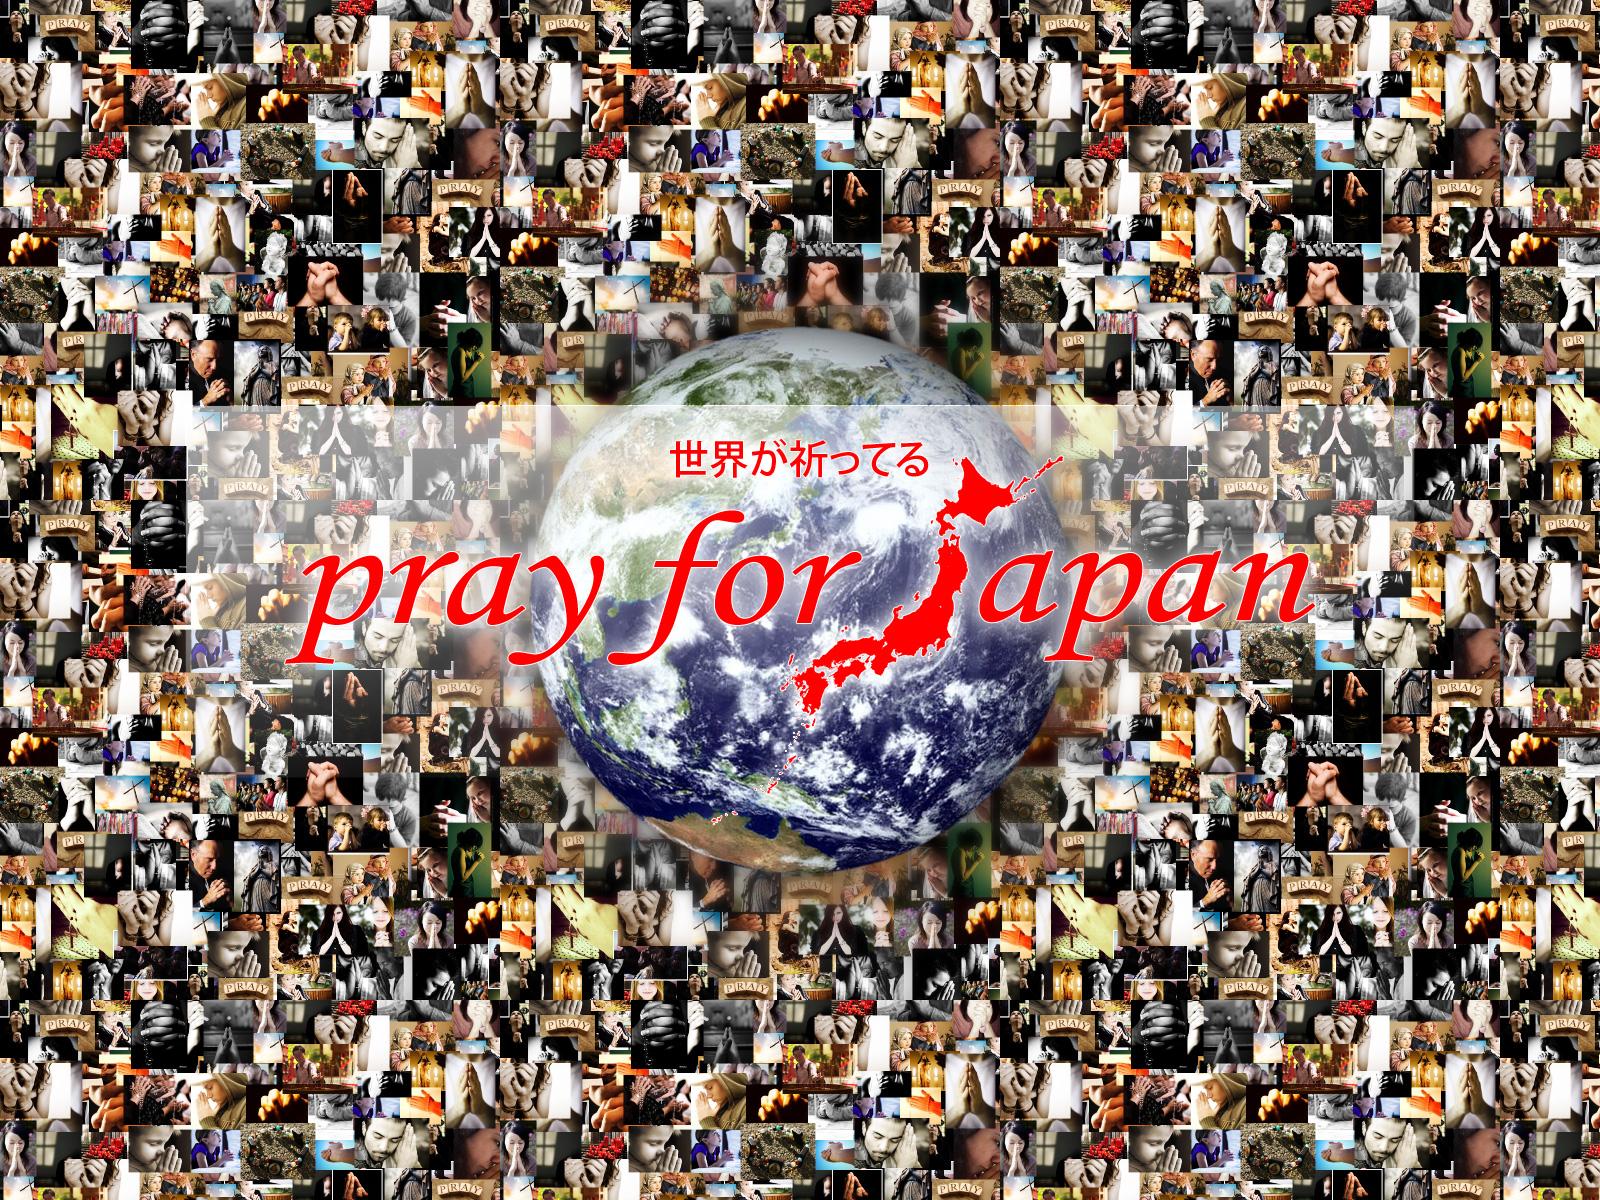 20110311_prayforjapan